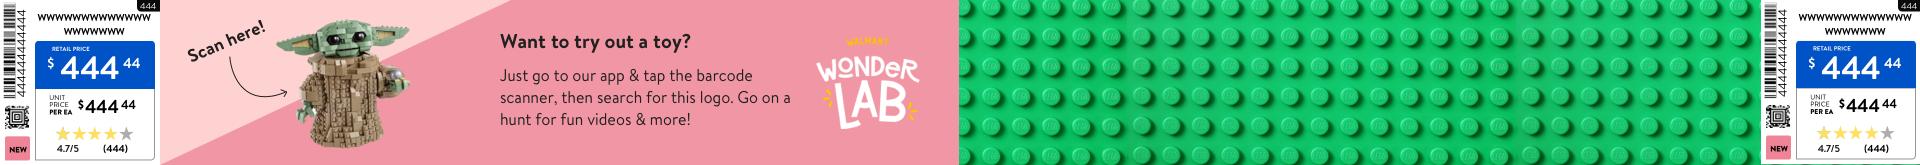 digital shelf label design for lego